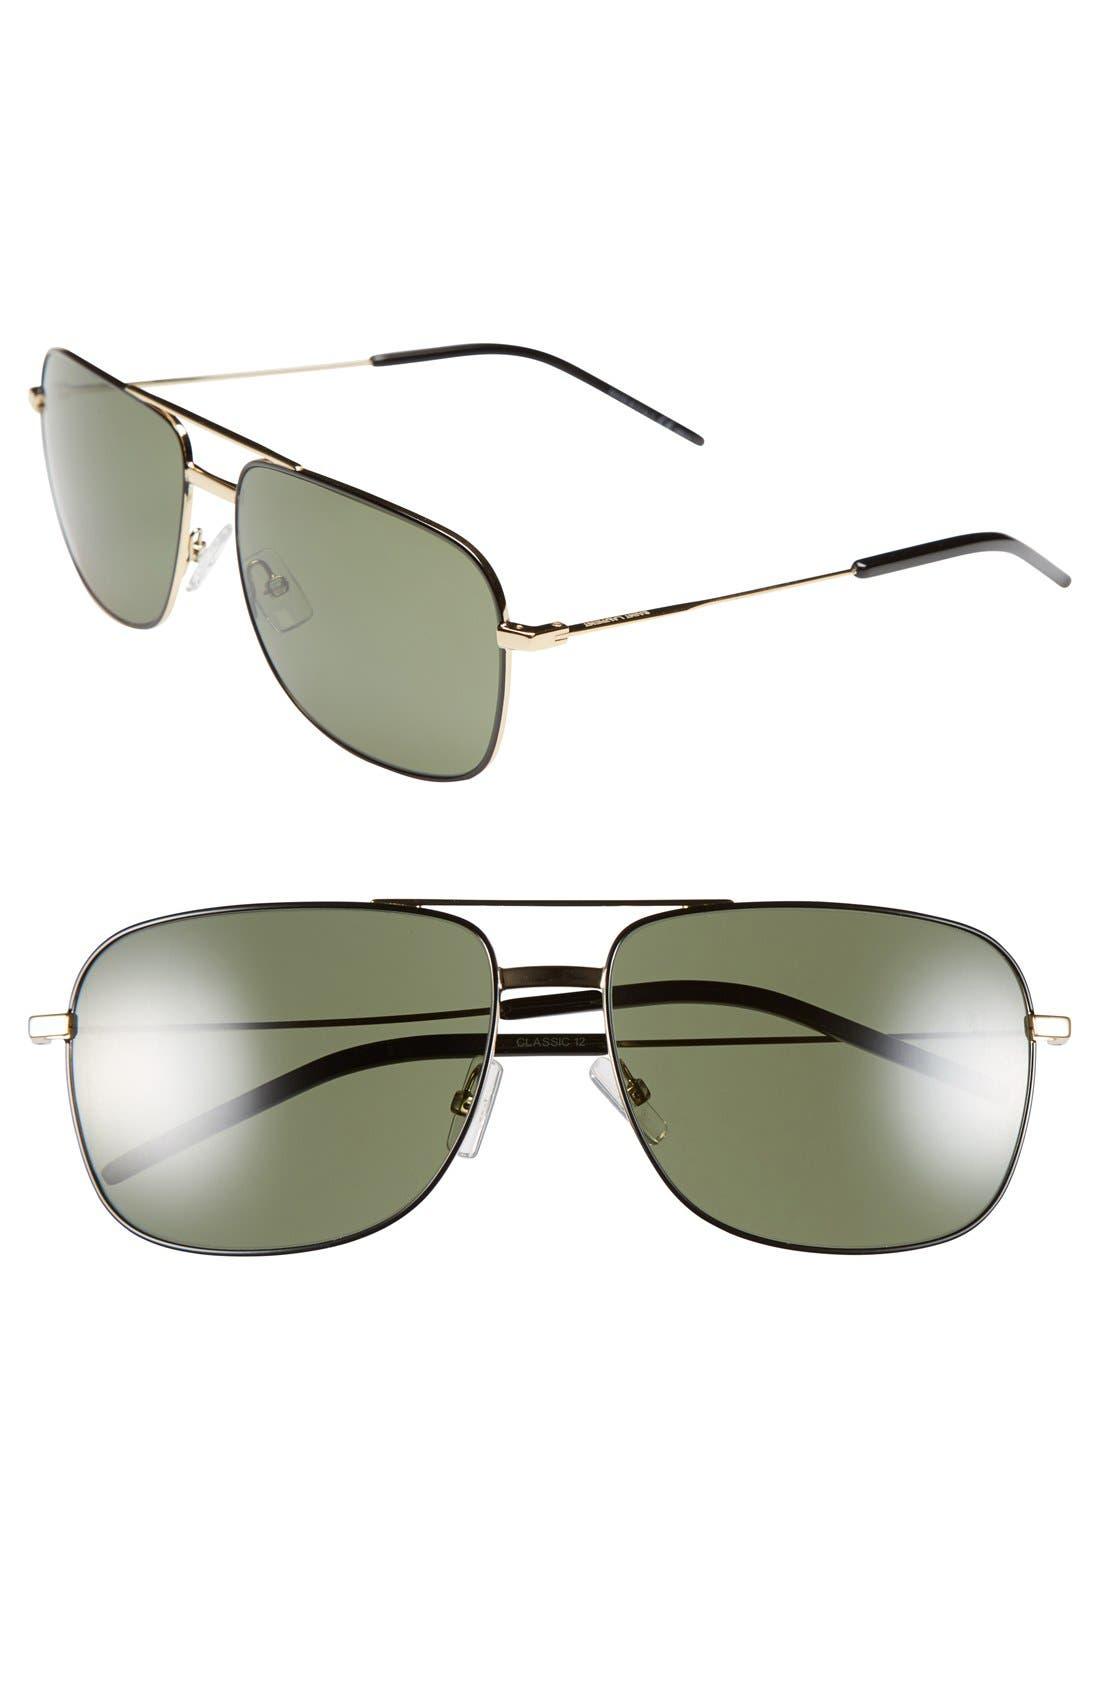 Alternate Image 1 Selected - Saint Laurent 59mm Navigator Sunglasses